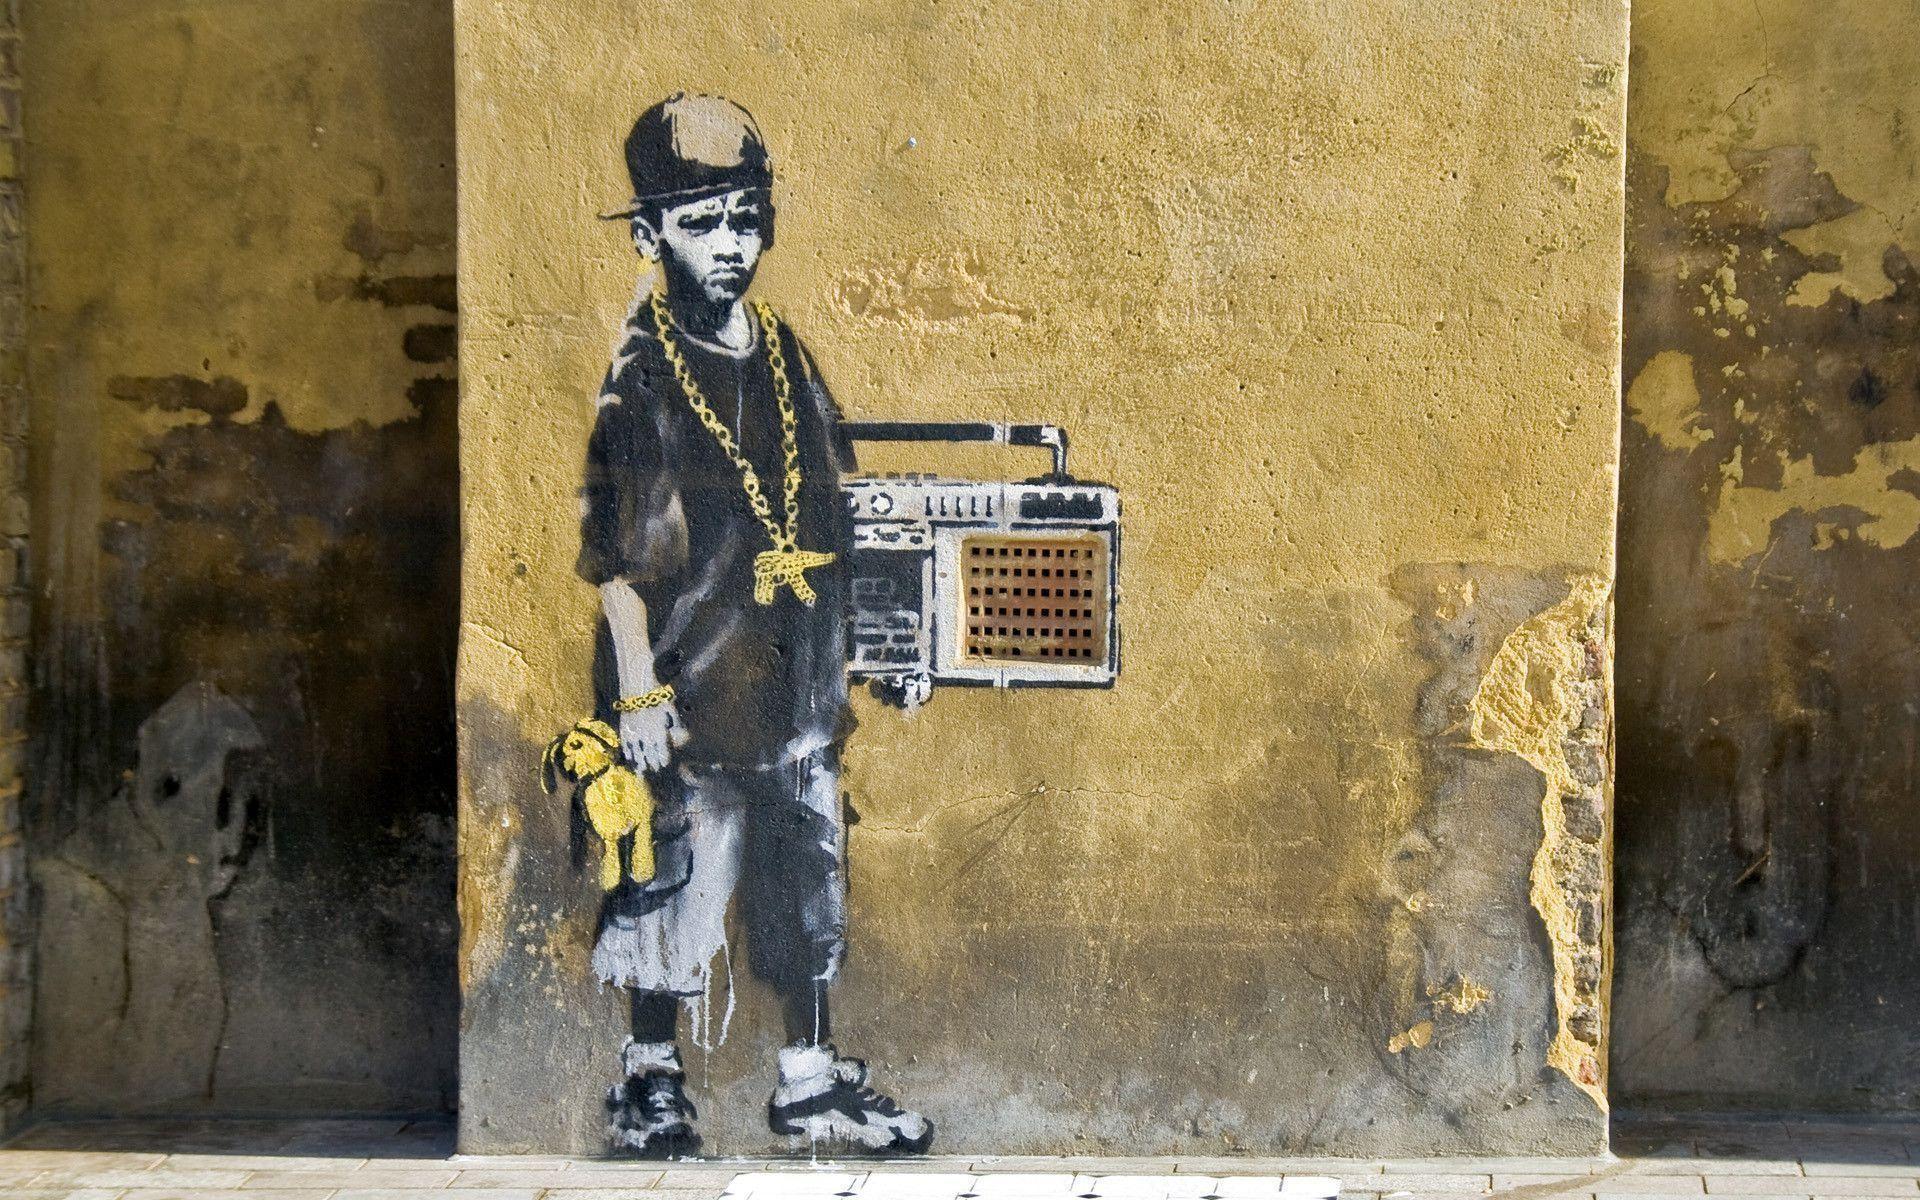 hip hop graffiti wallpaper (55+ images)